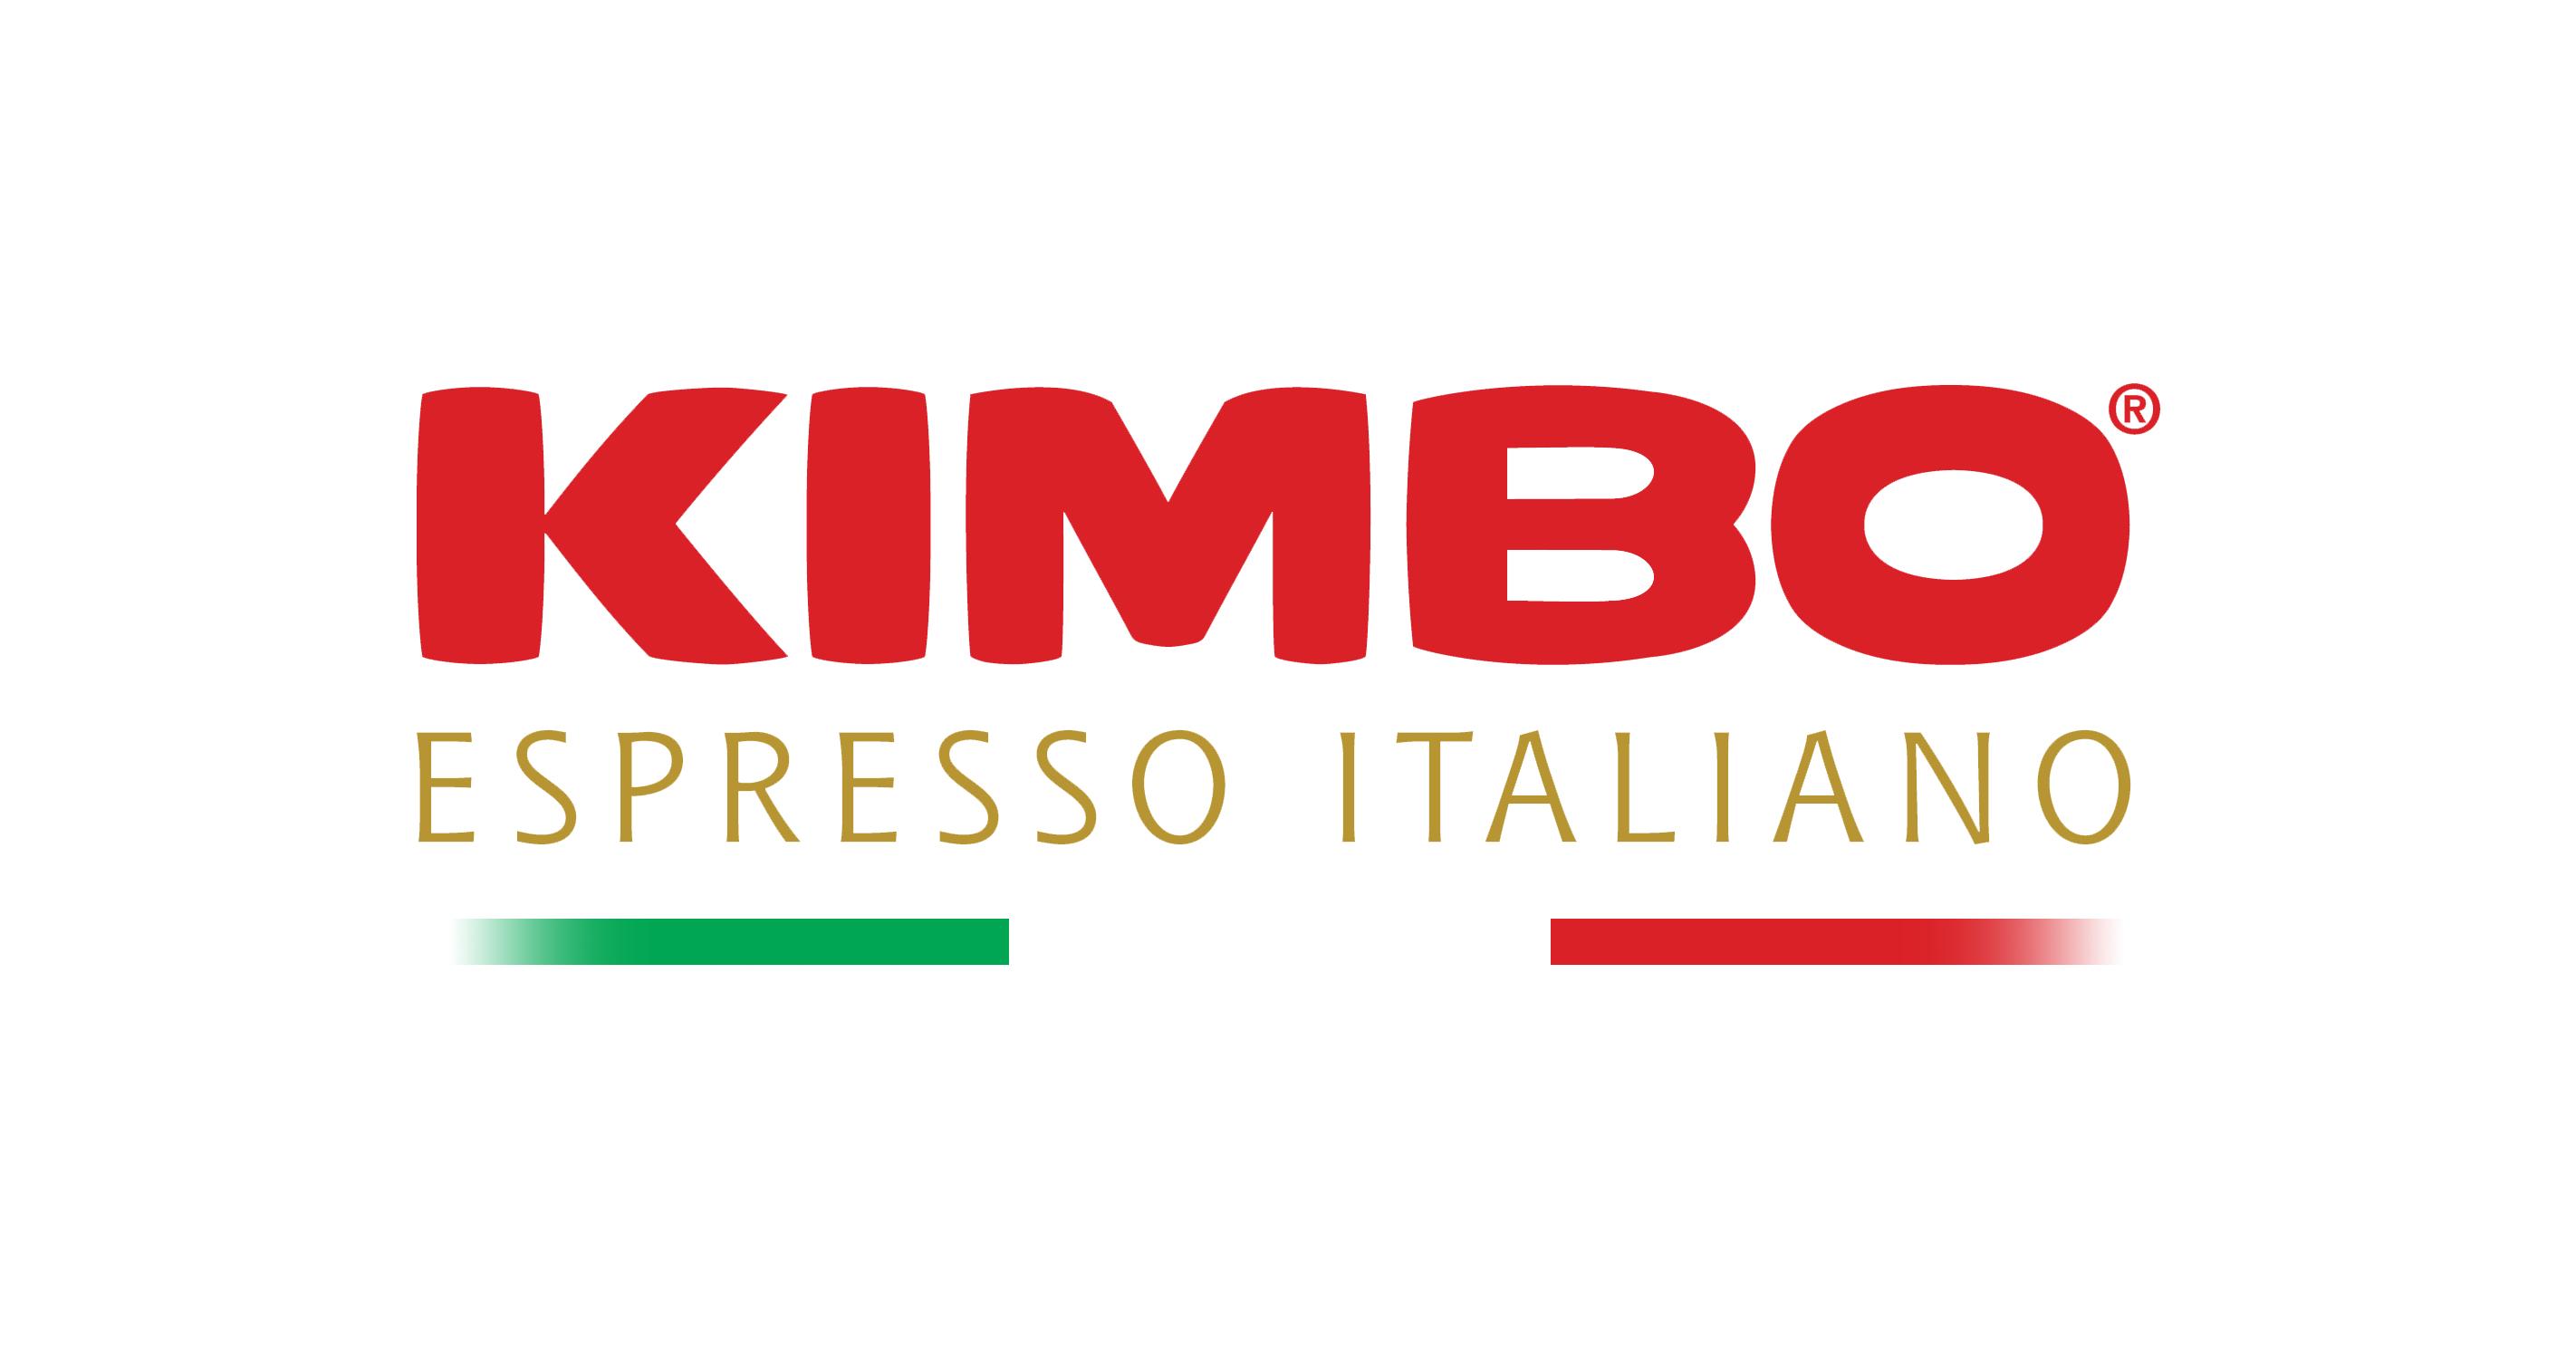 كيمبو KIMBO